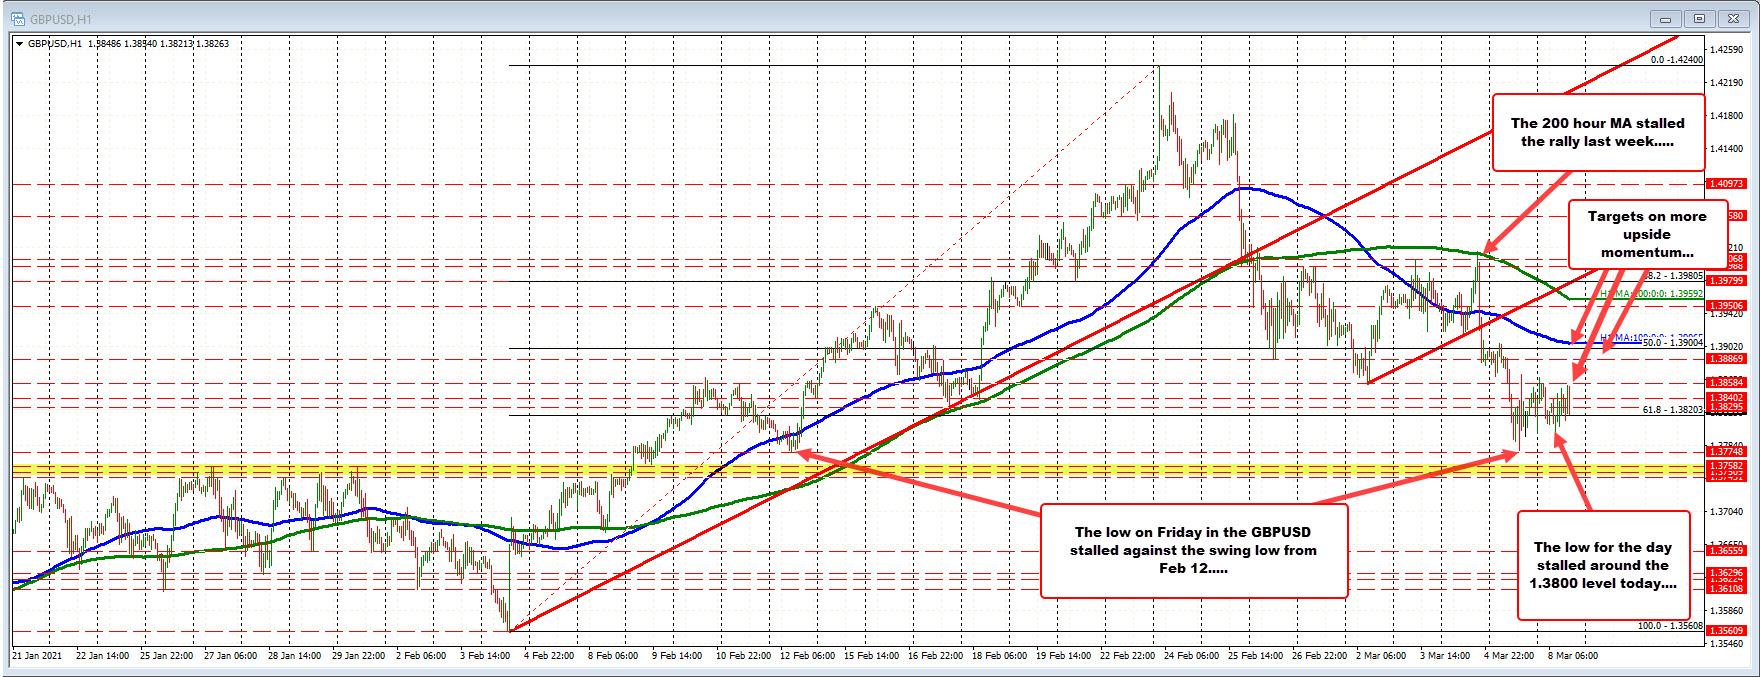 Modest trading range for the day_